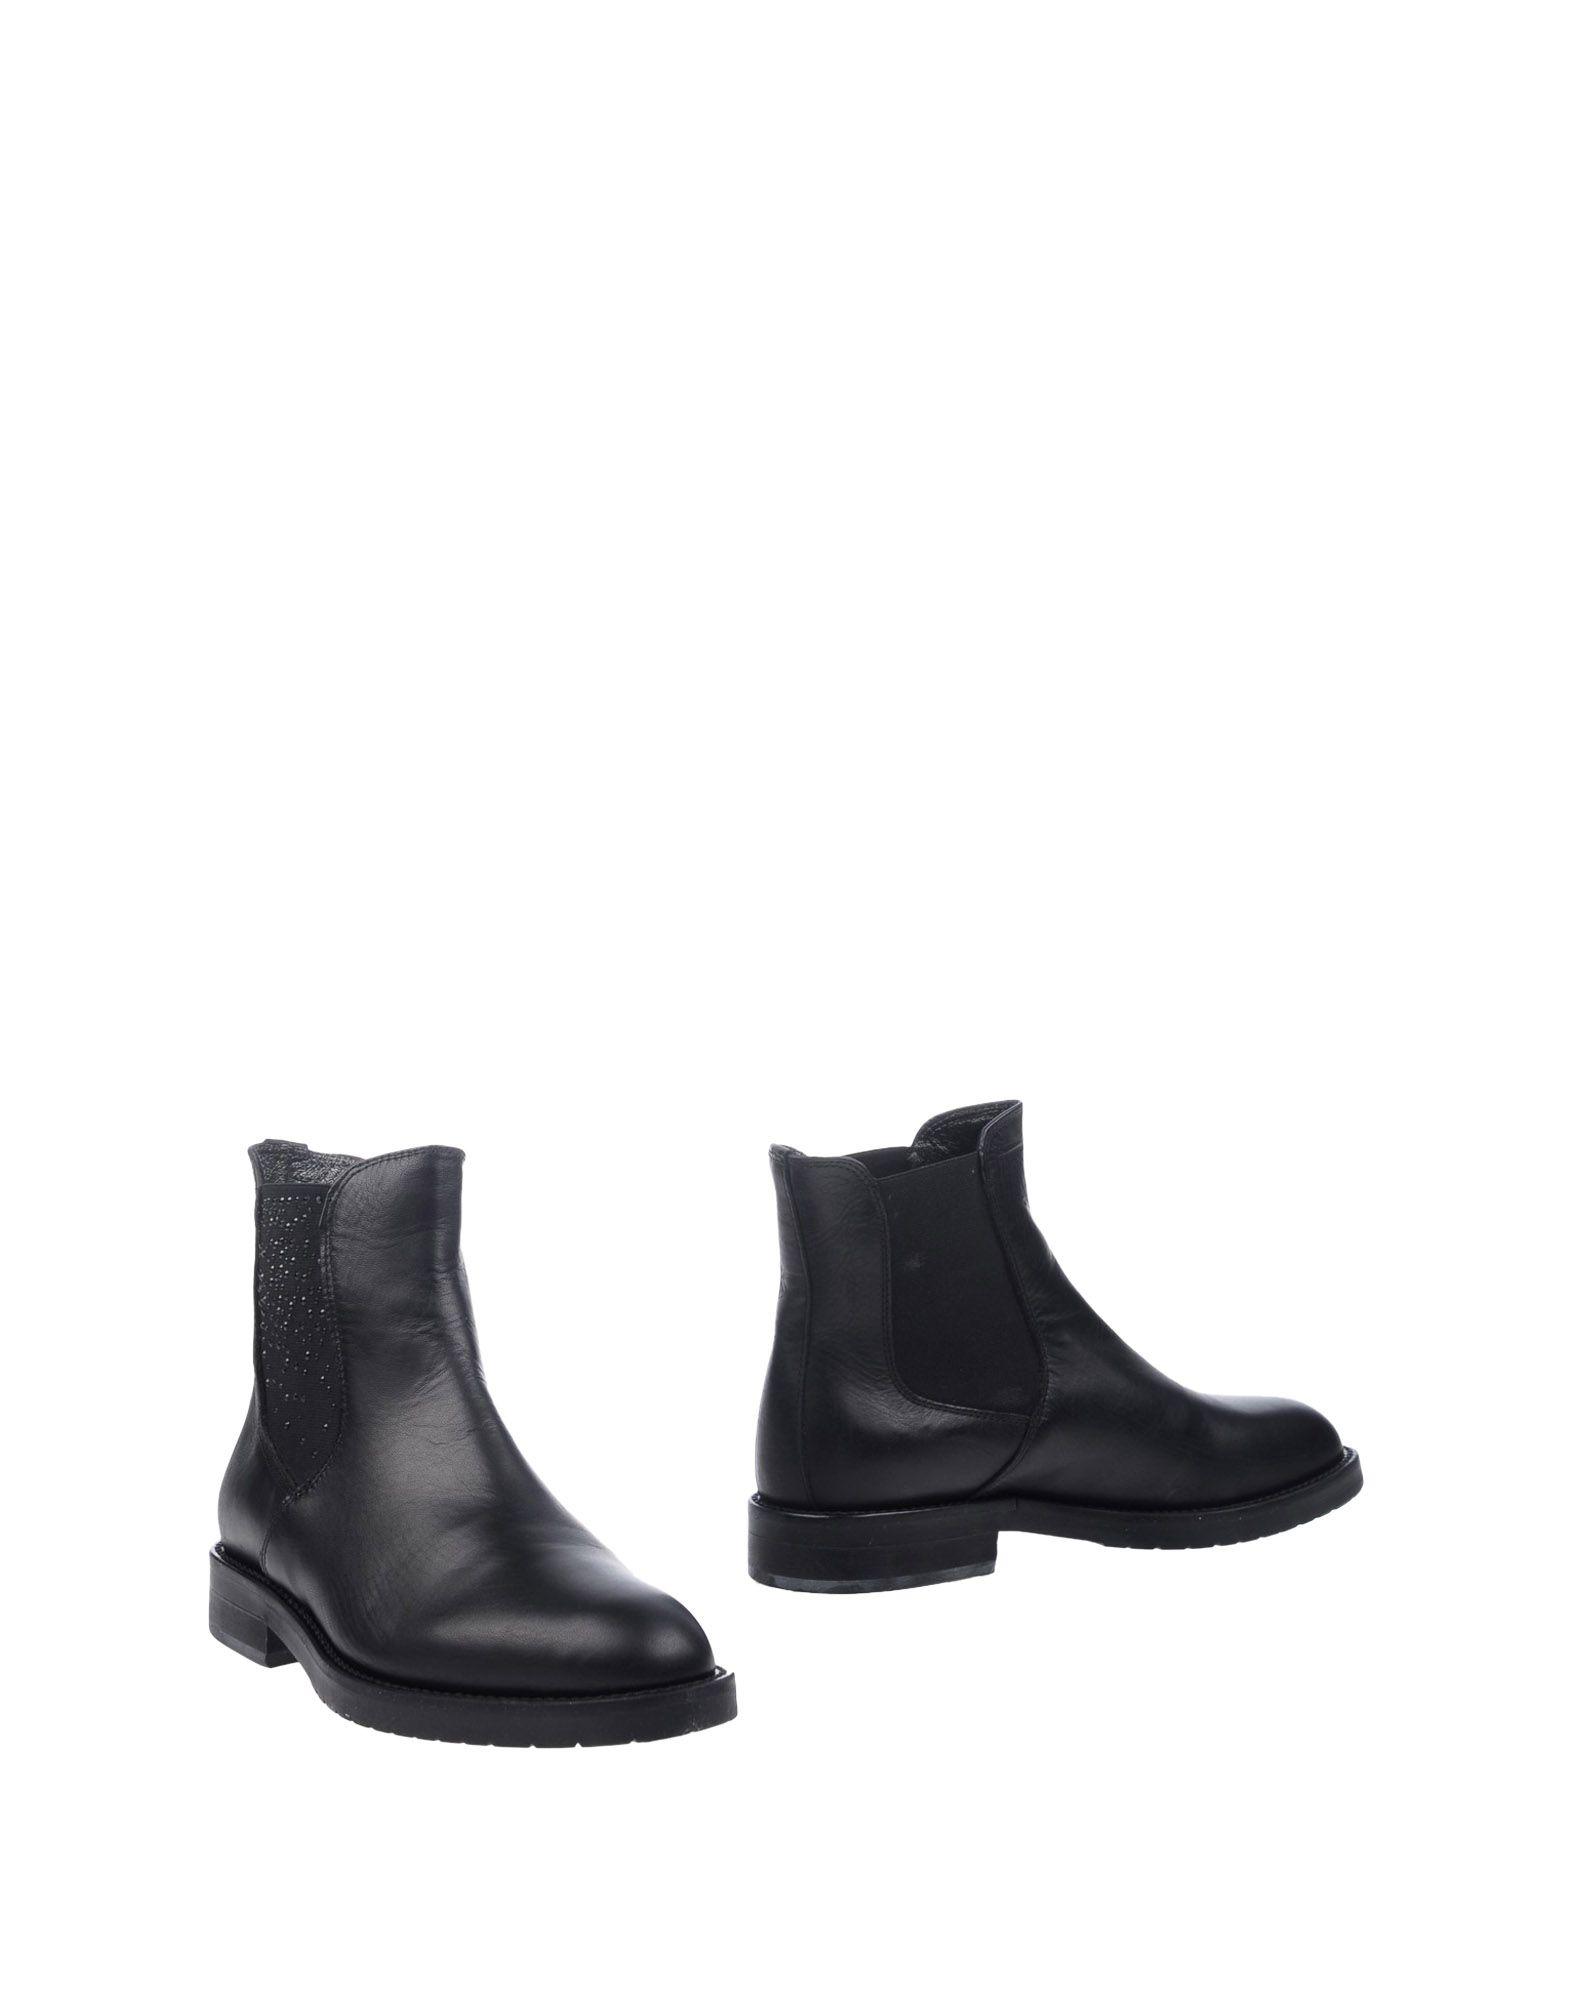 Andrea Morelli Boots Chelsea Boots Morelli Damen  11301827OH Gute Qualität beliebte Schuhe 218f28